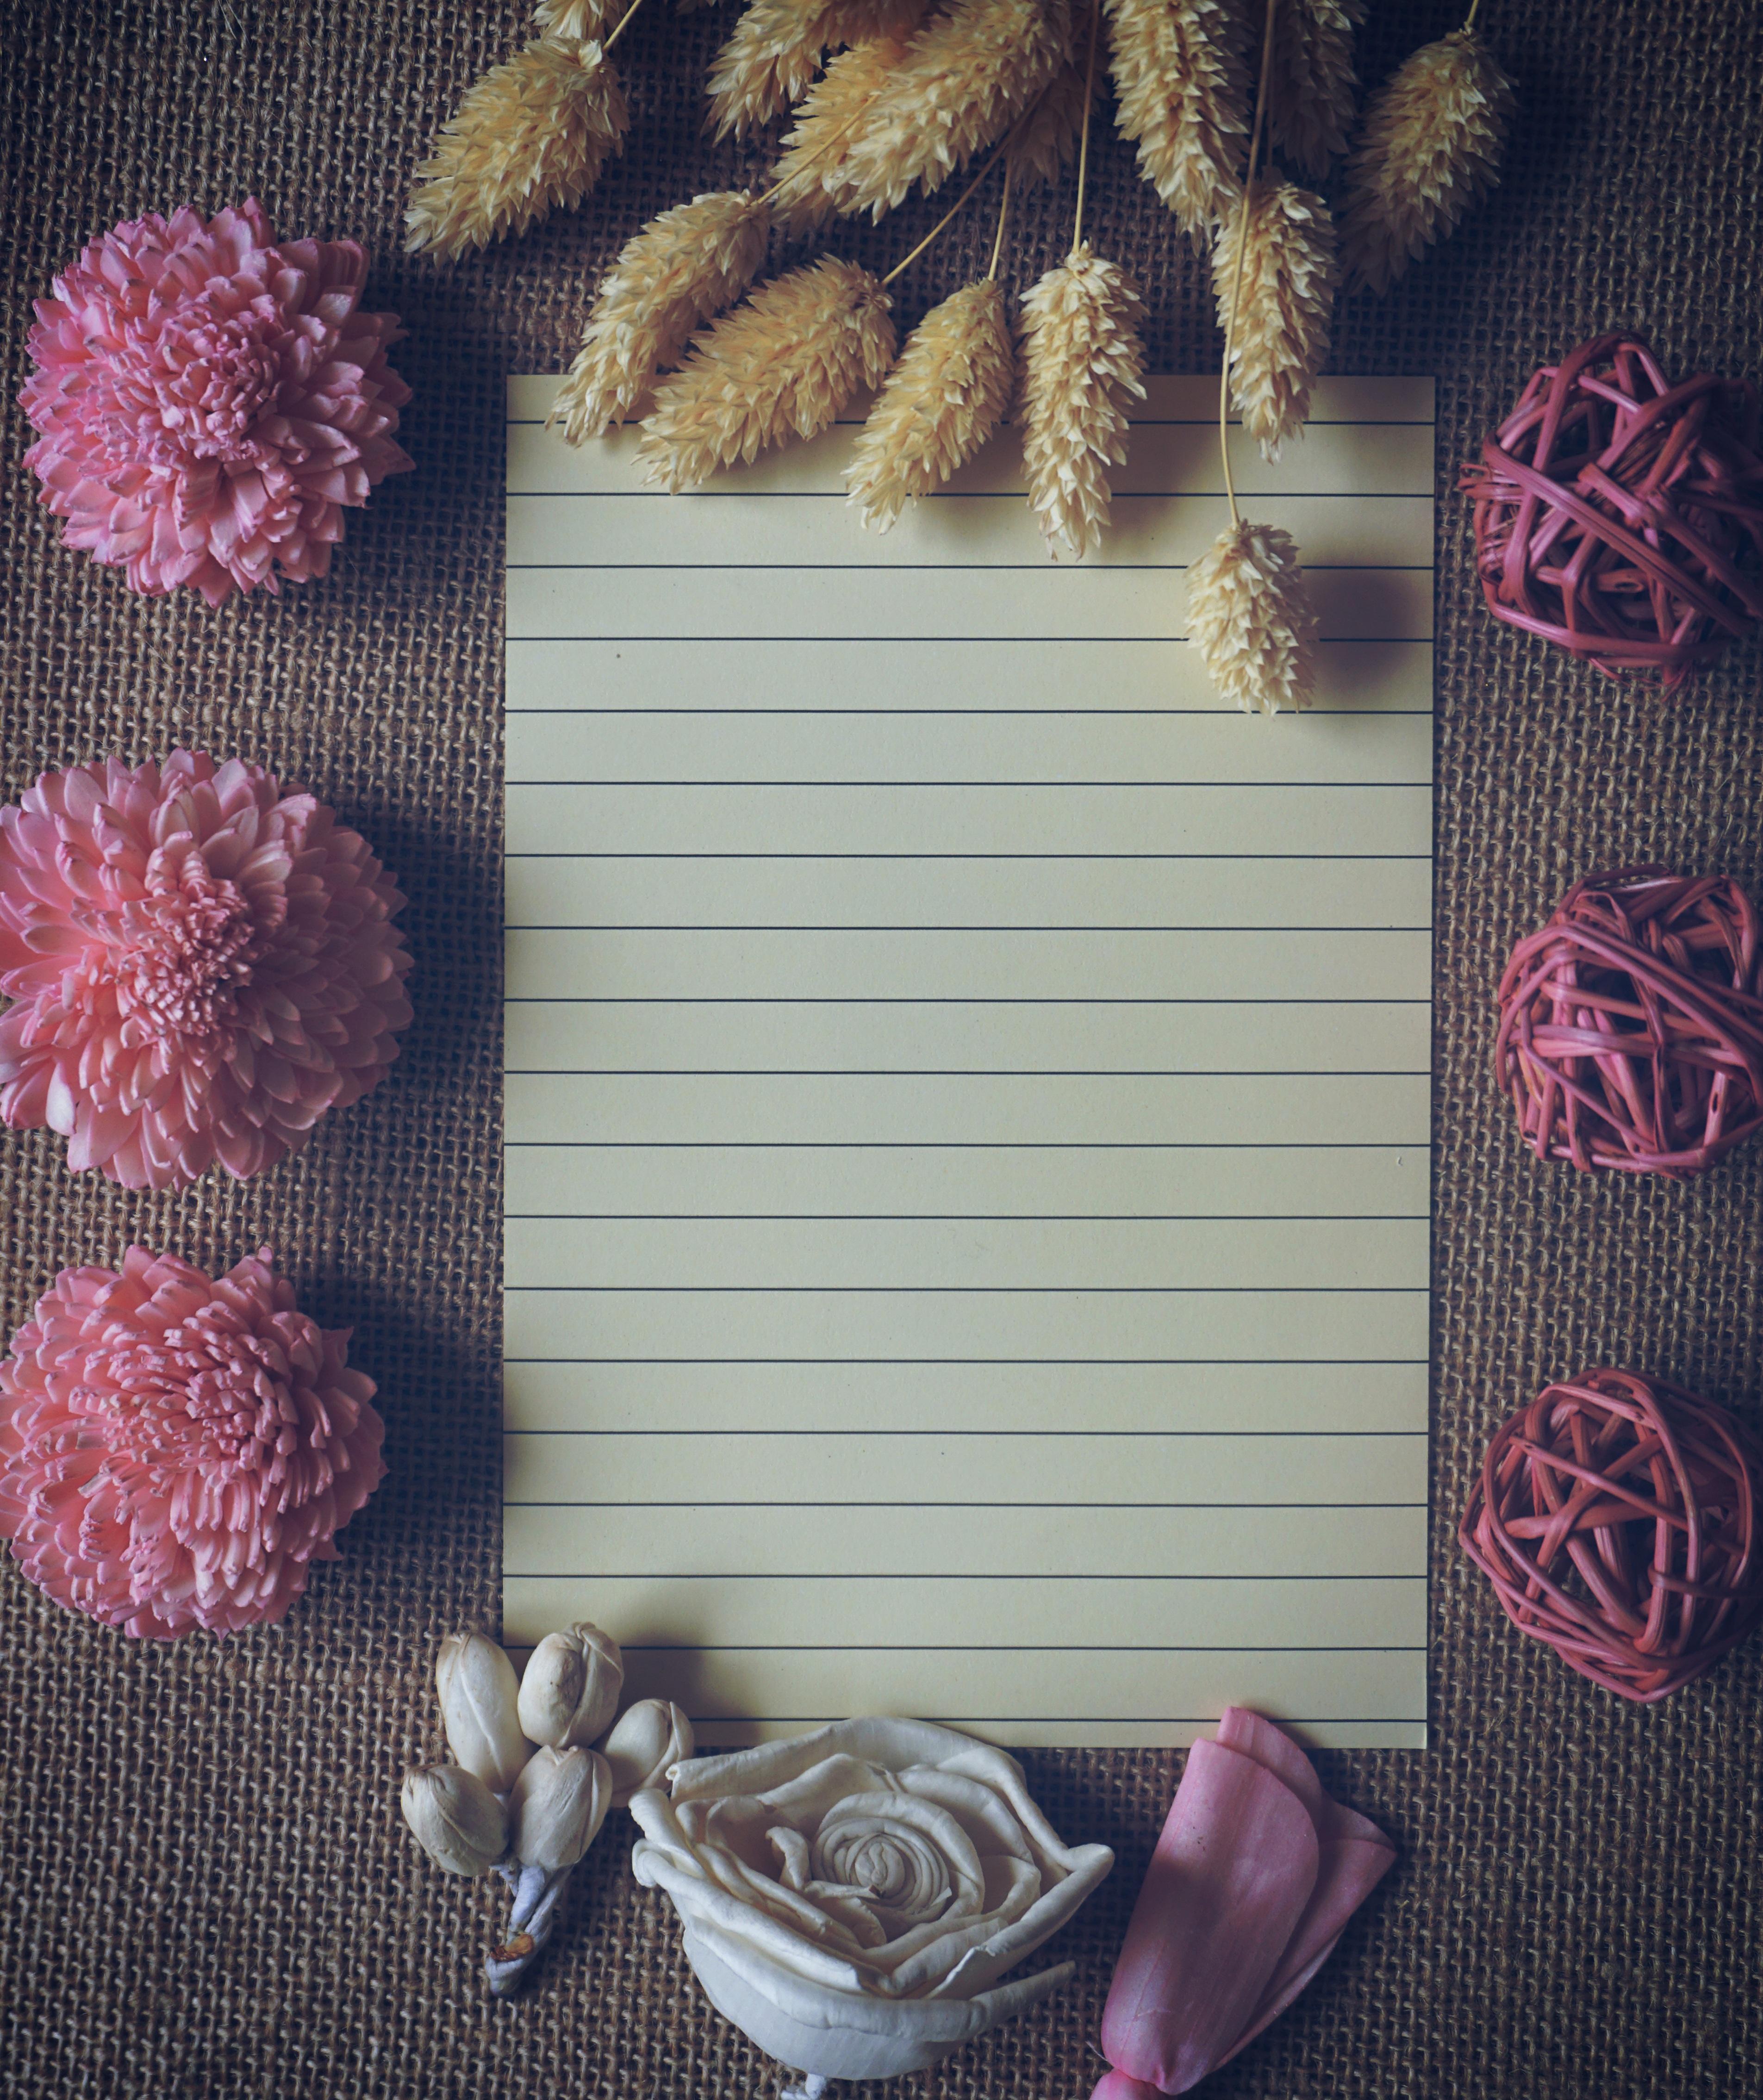 Fotos gratis : vendimia, textura, flor, pétalo, linda, patrón, arte ...